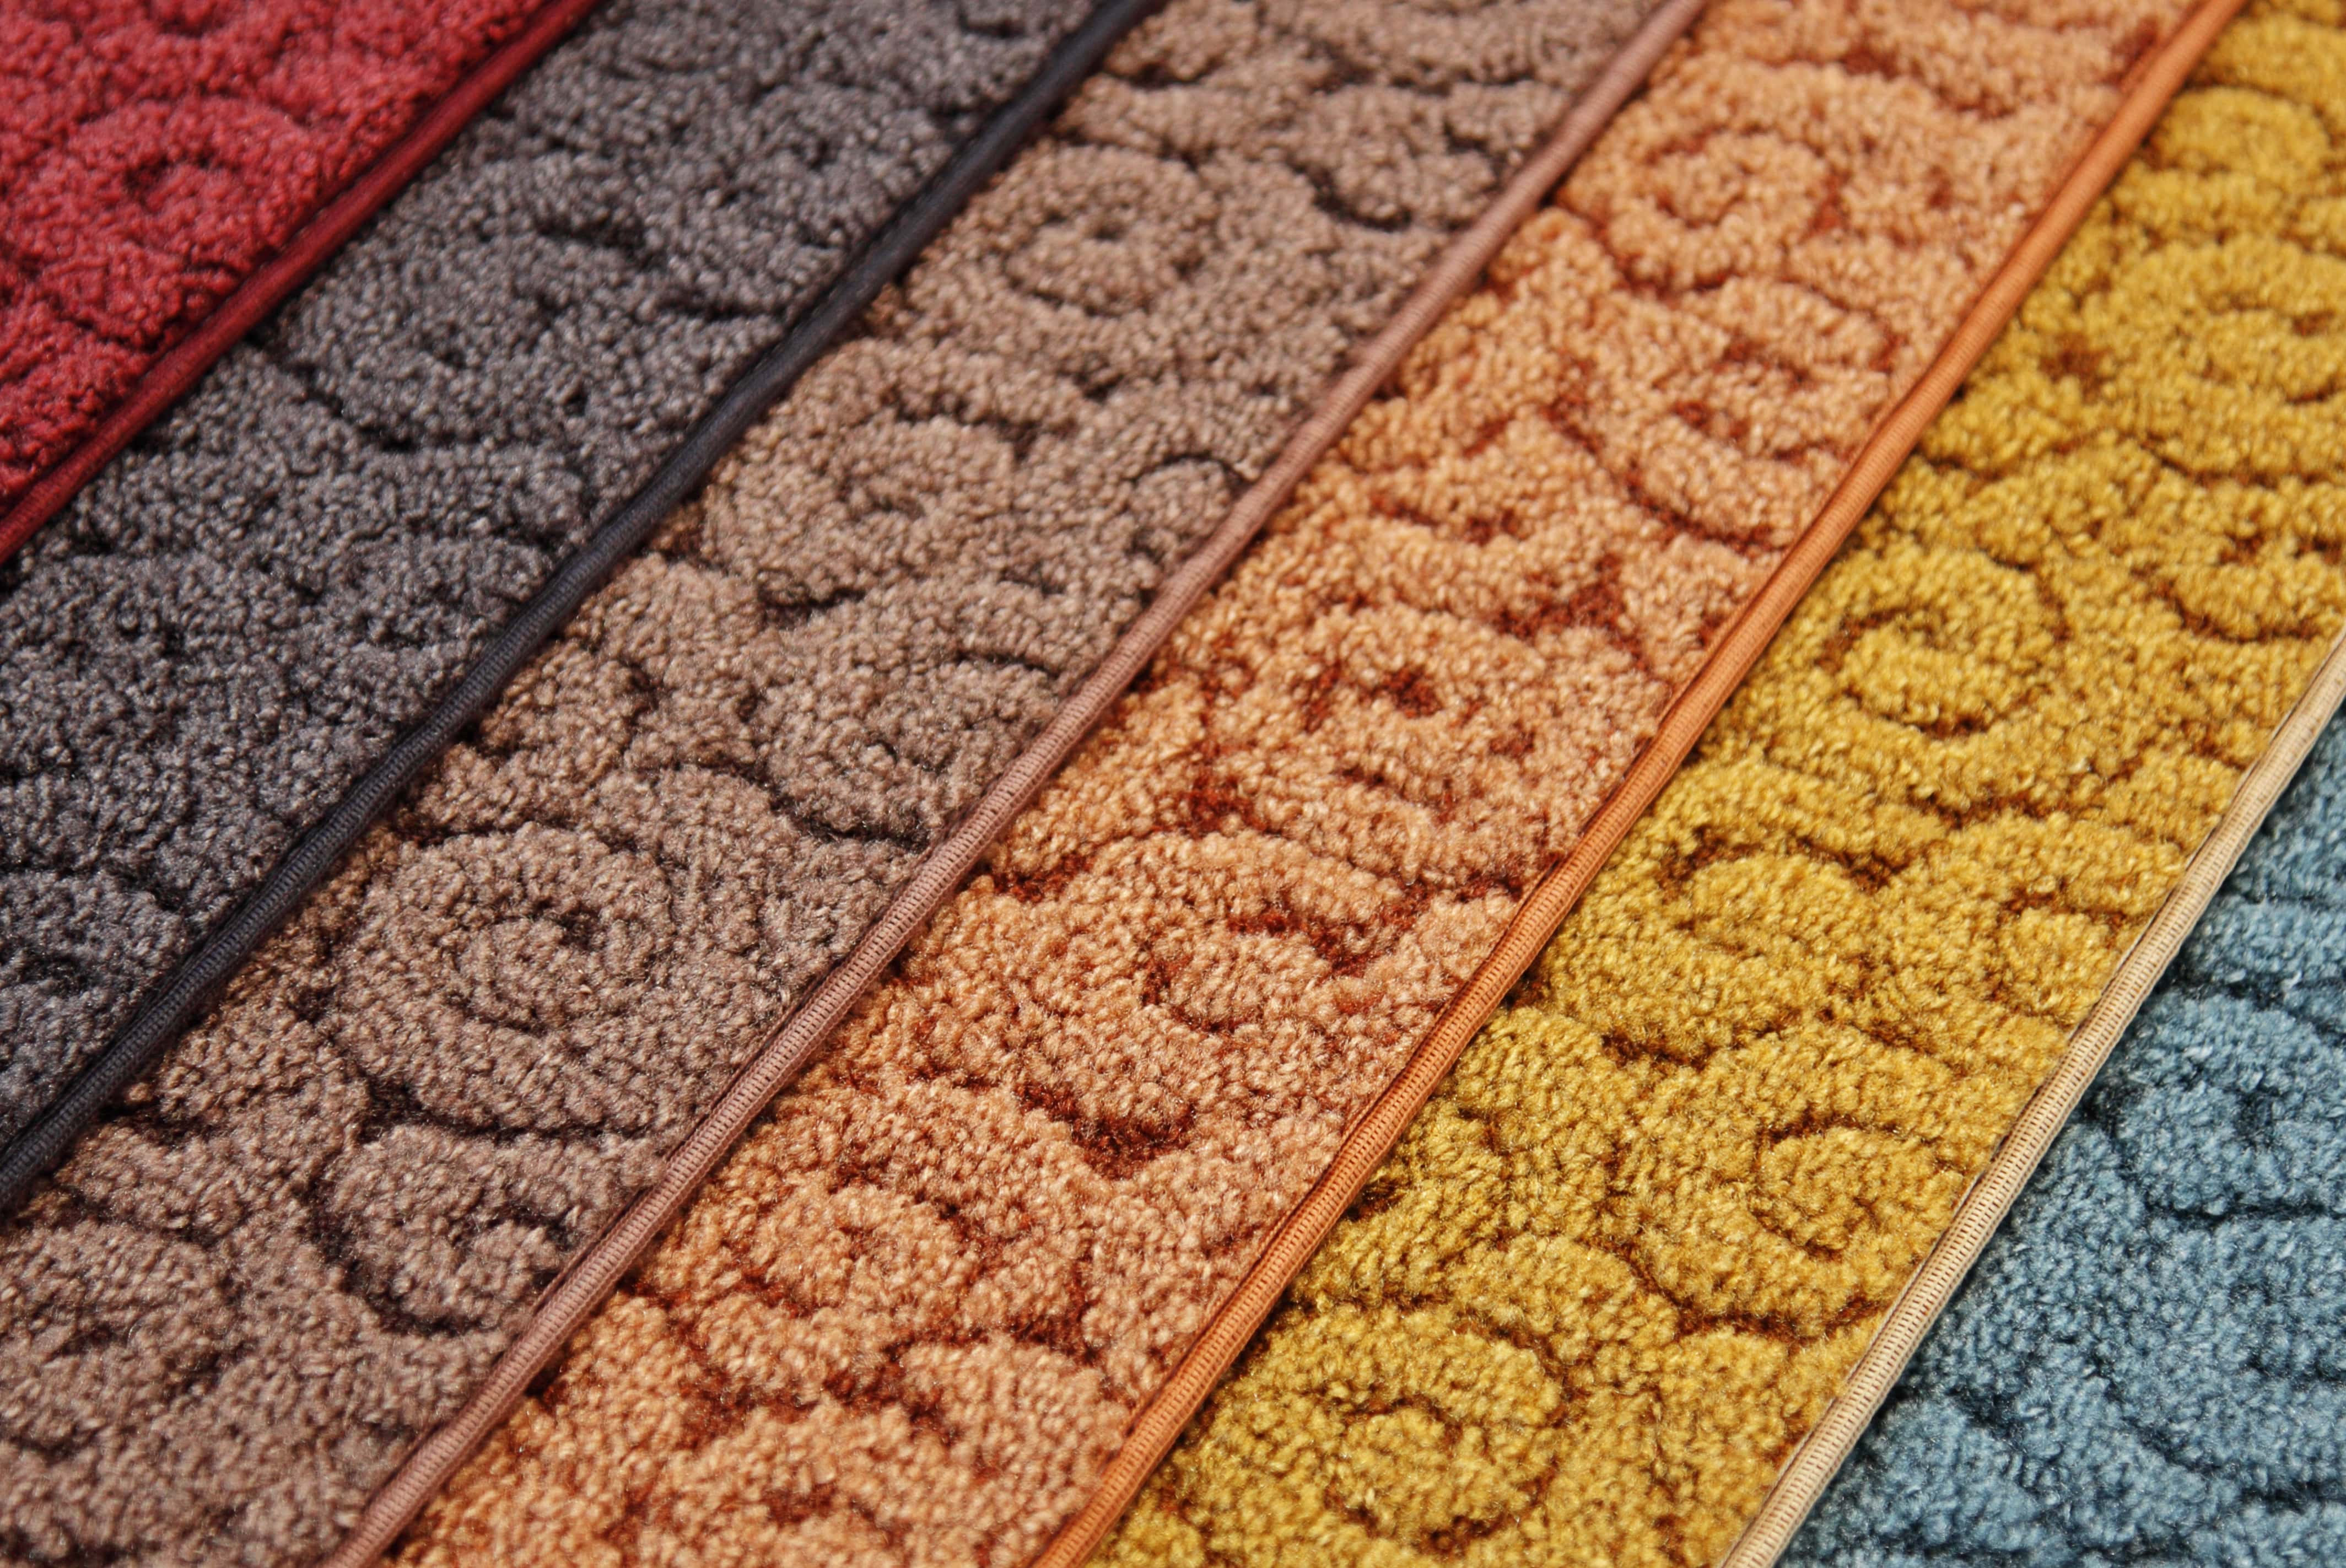 Bright Textured Carpet Options - - Floor Coverings International Waukesha